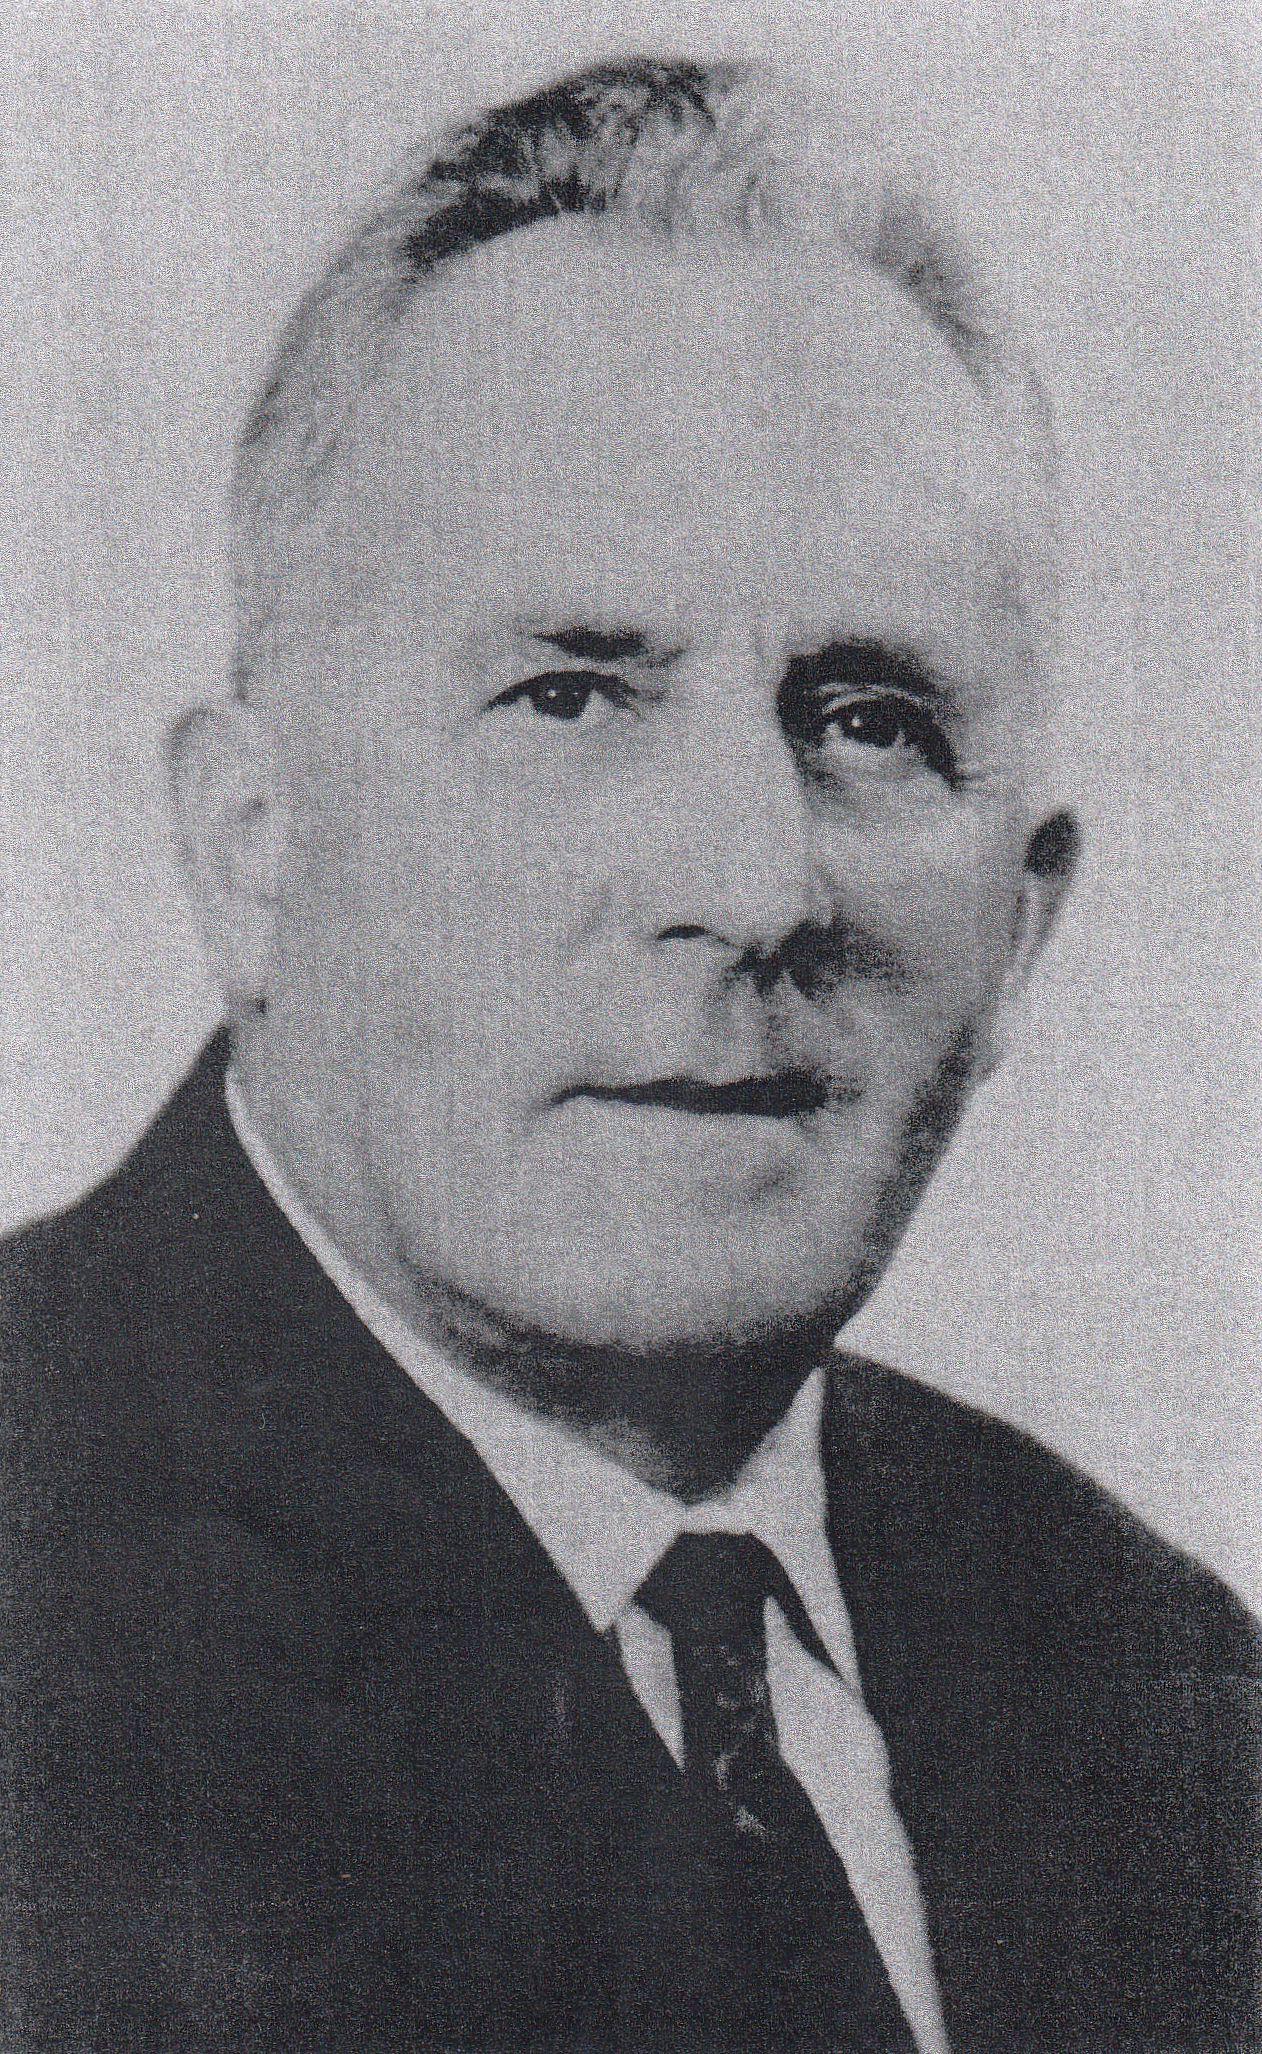 Josef Fischer (1898-1982)